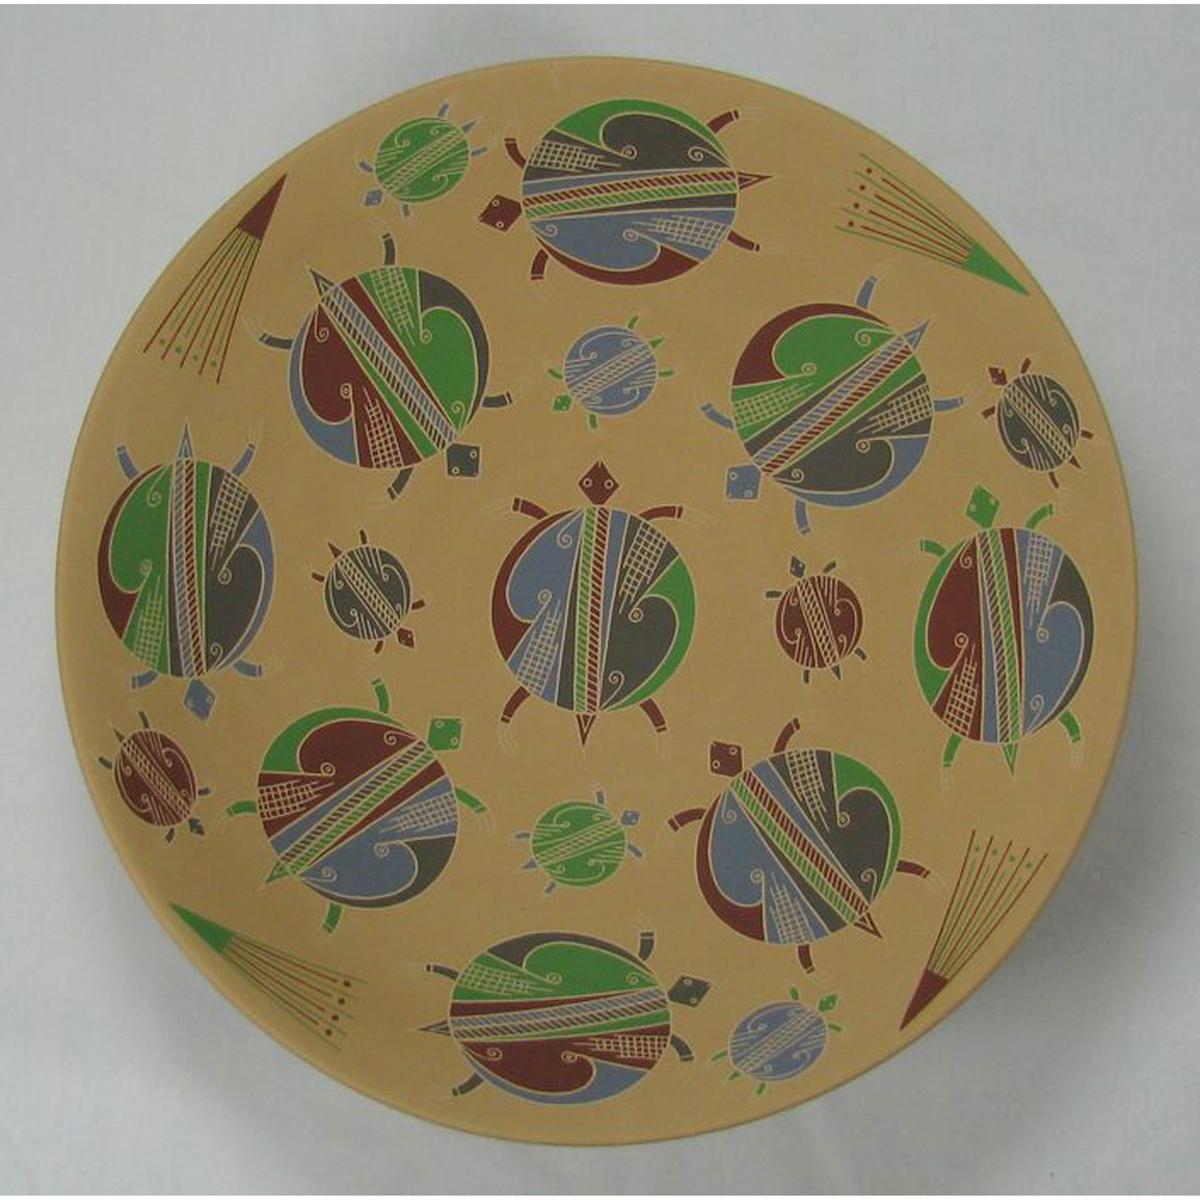 Mata Ortiz Pottery, Chihuahua Ramiro Veloz Mata Ortiz Pottery